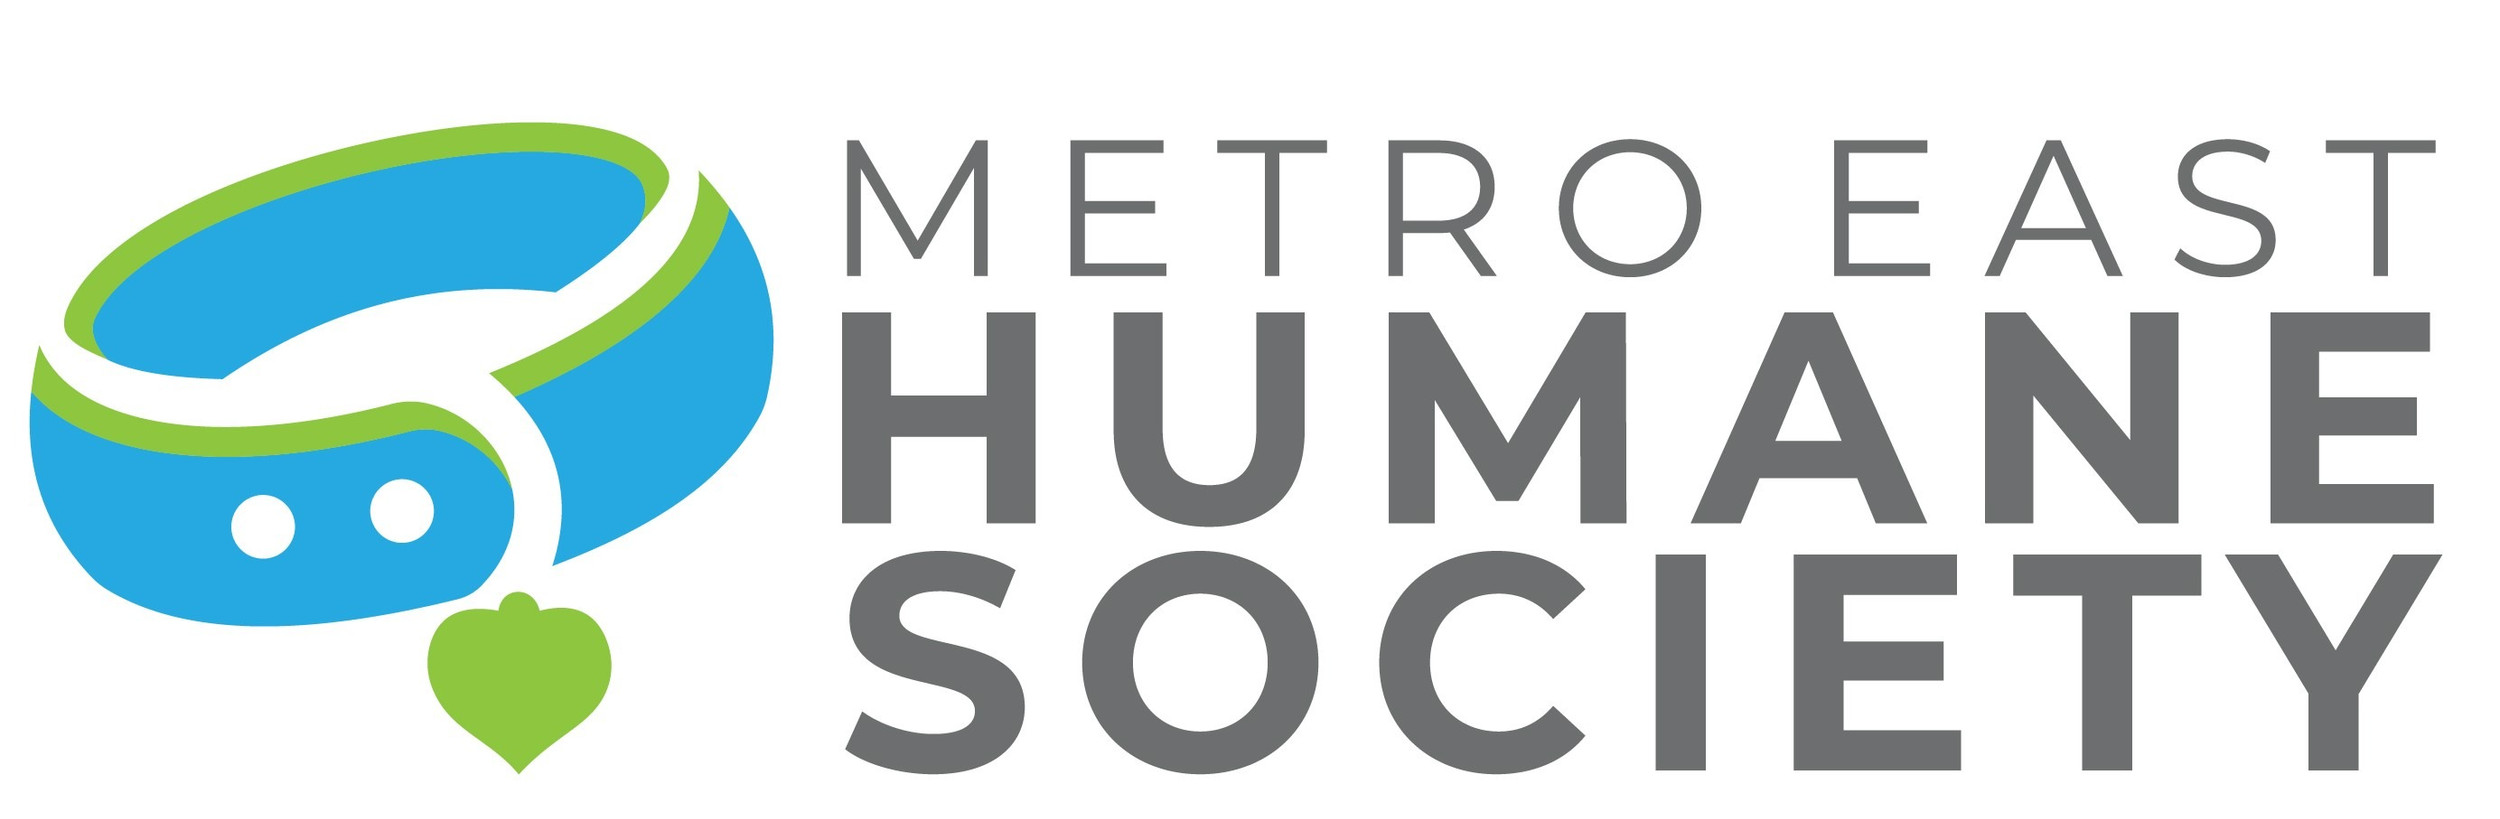 Metro East Human Society